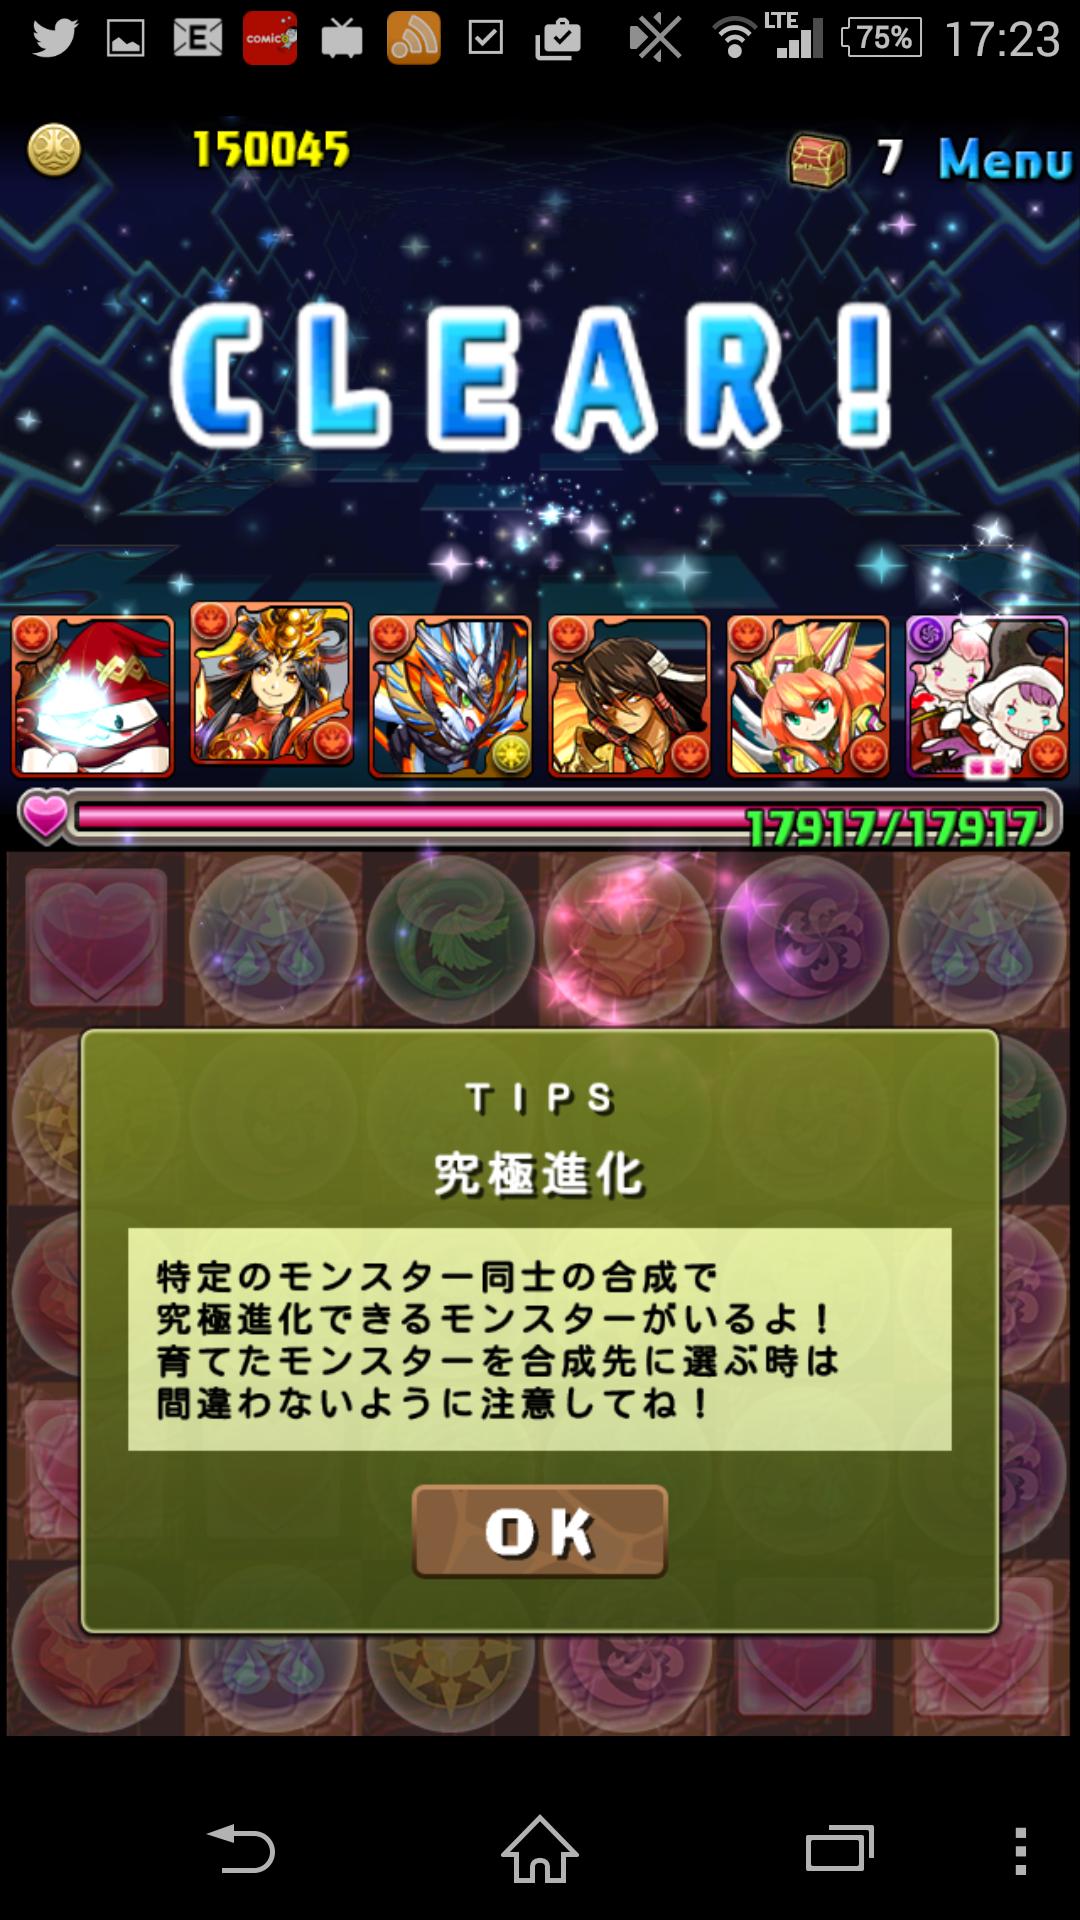 Screenshot_2015-03-21-17-24-00.png